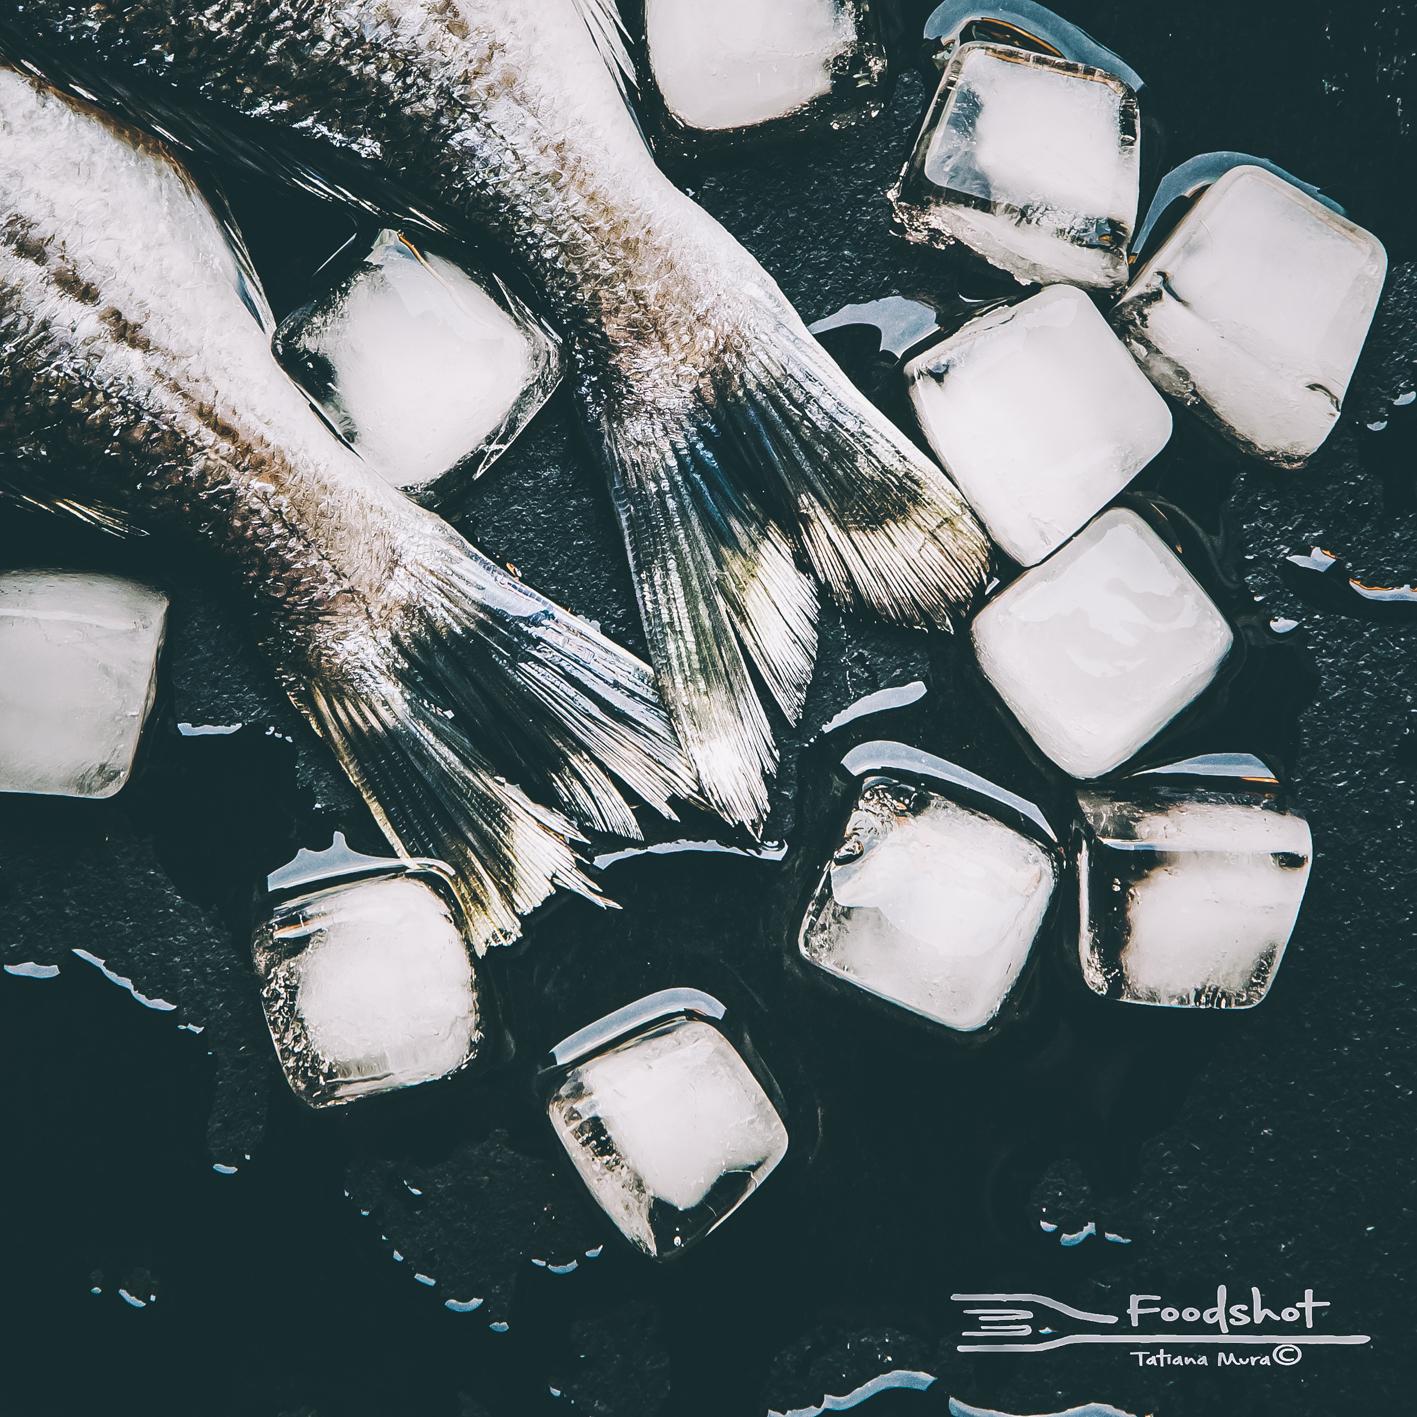 fish, pesci, food